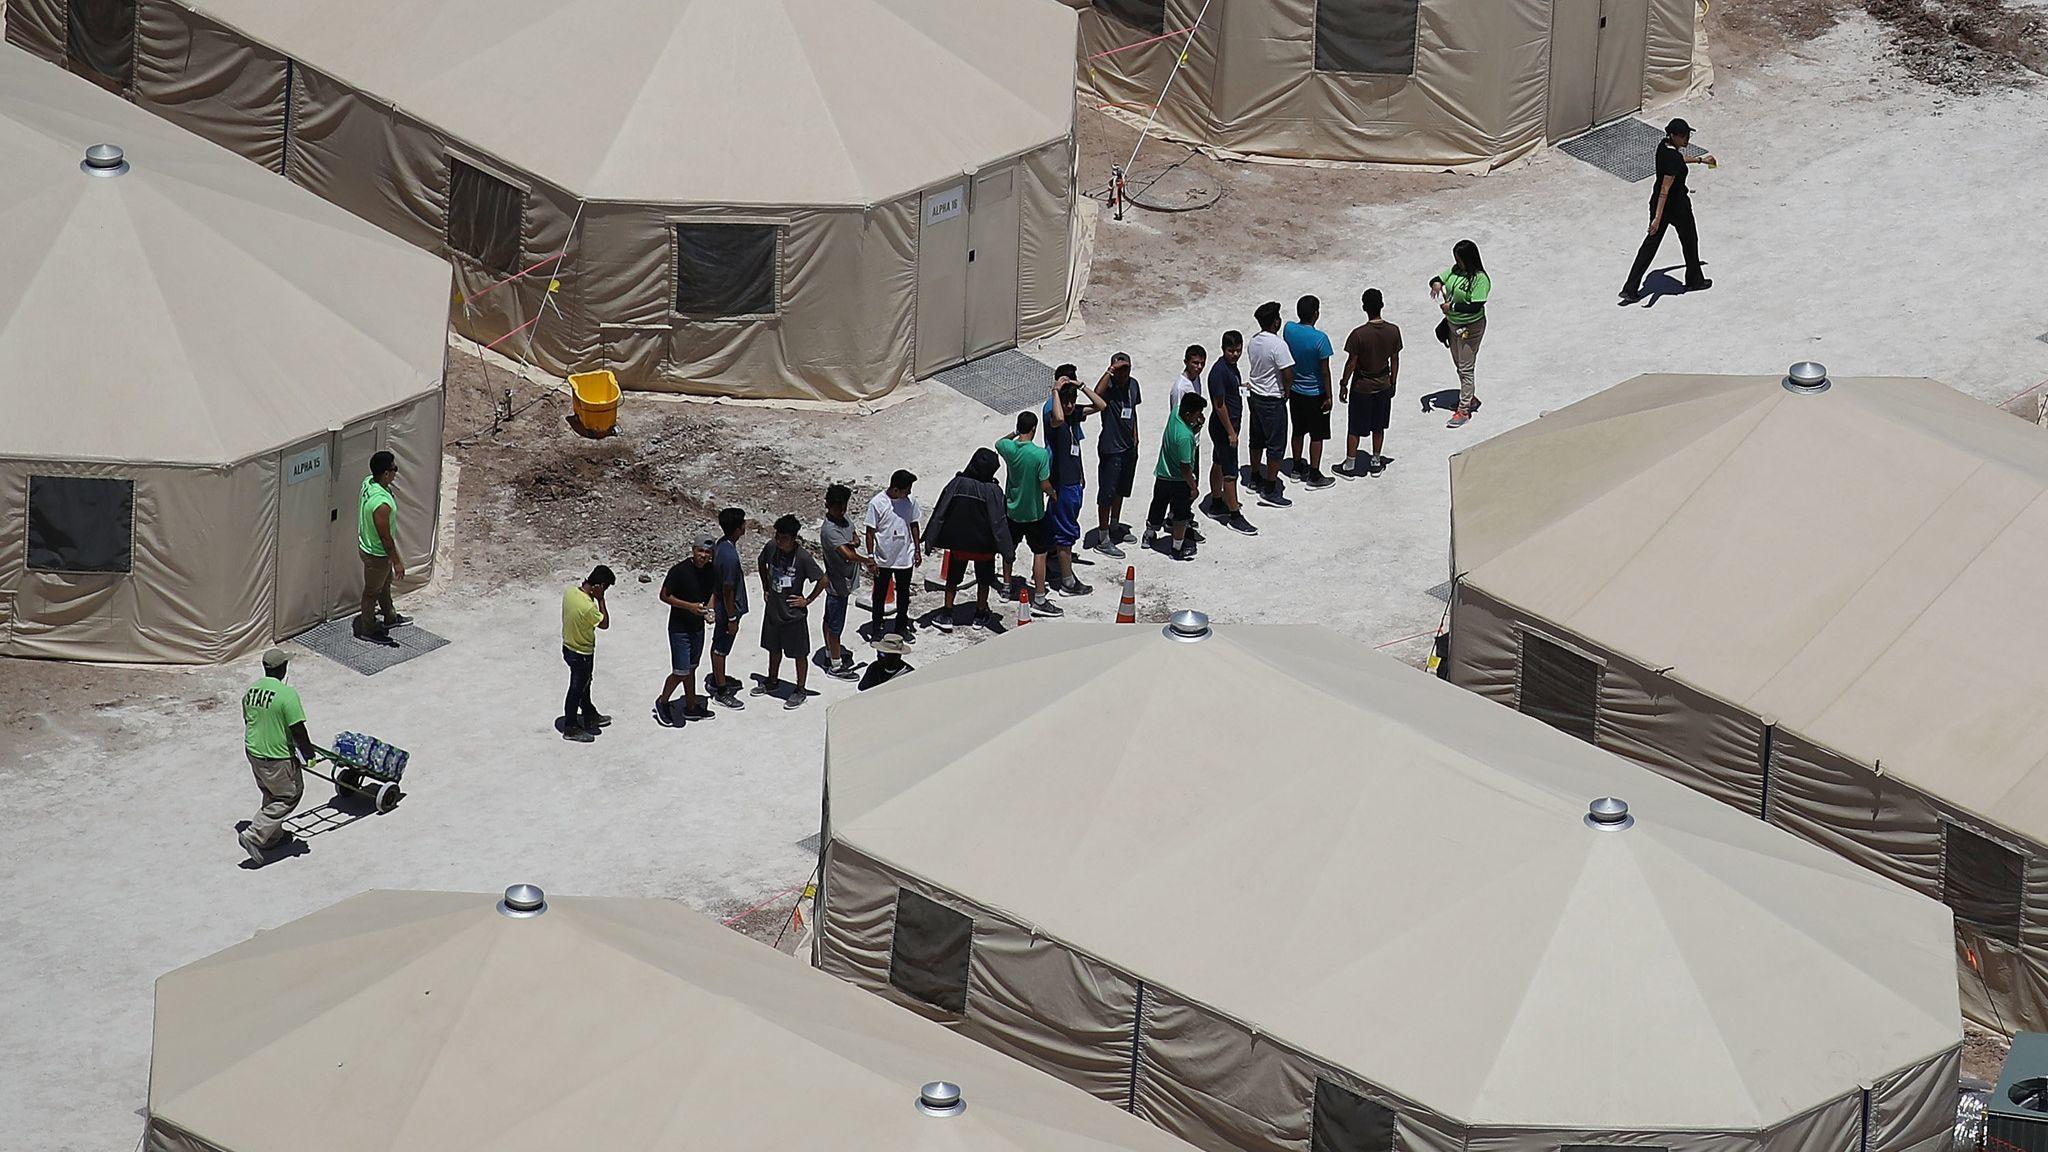 Tent encampment near port of entry in Tornillo, Texas.